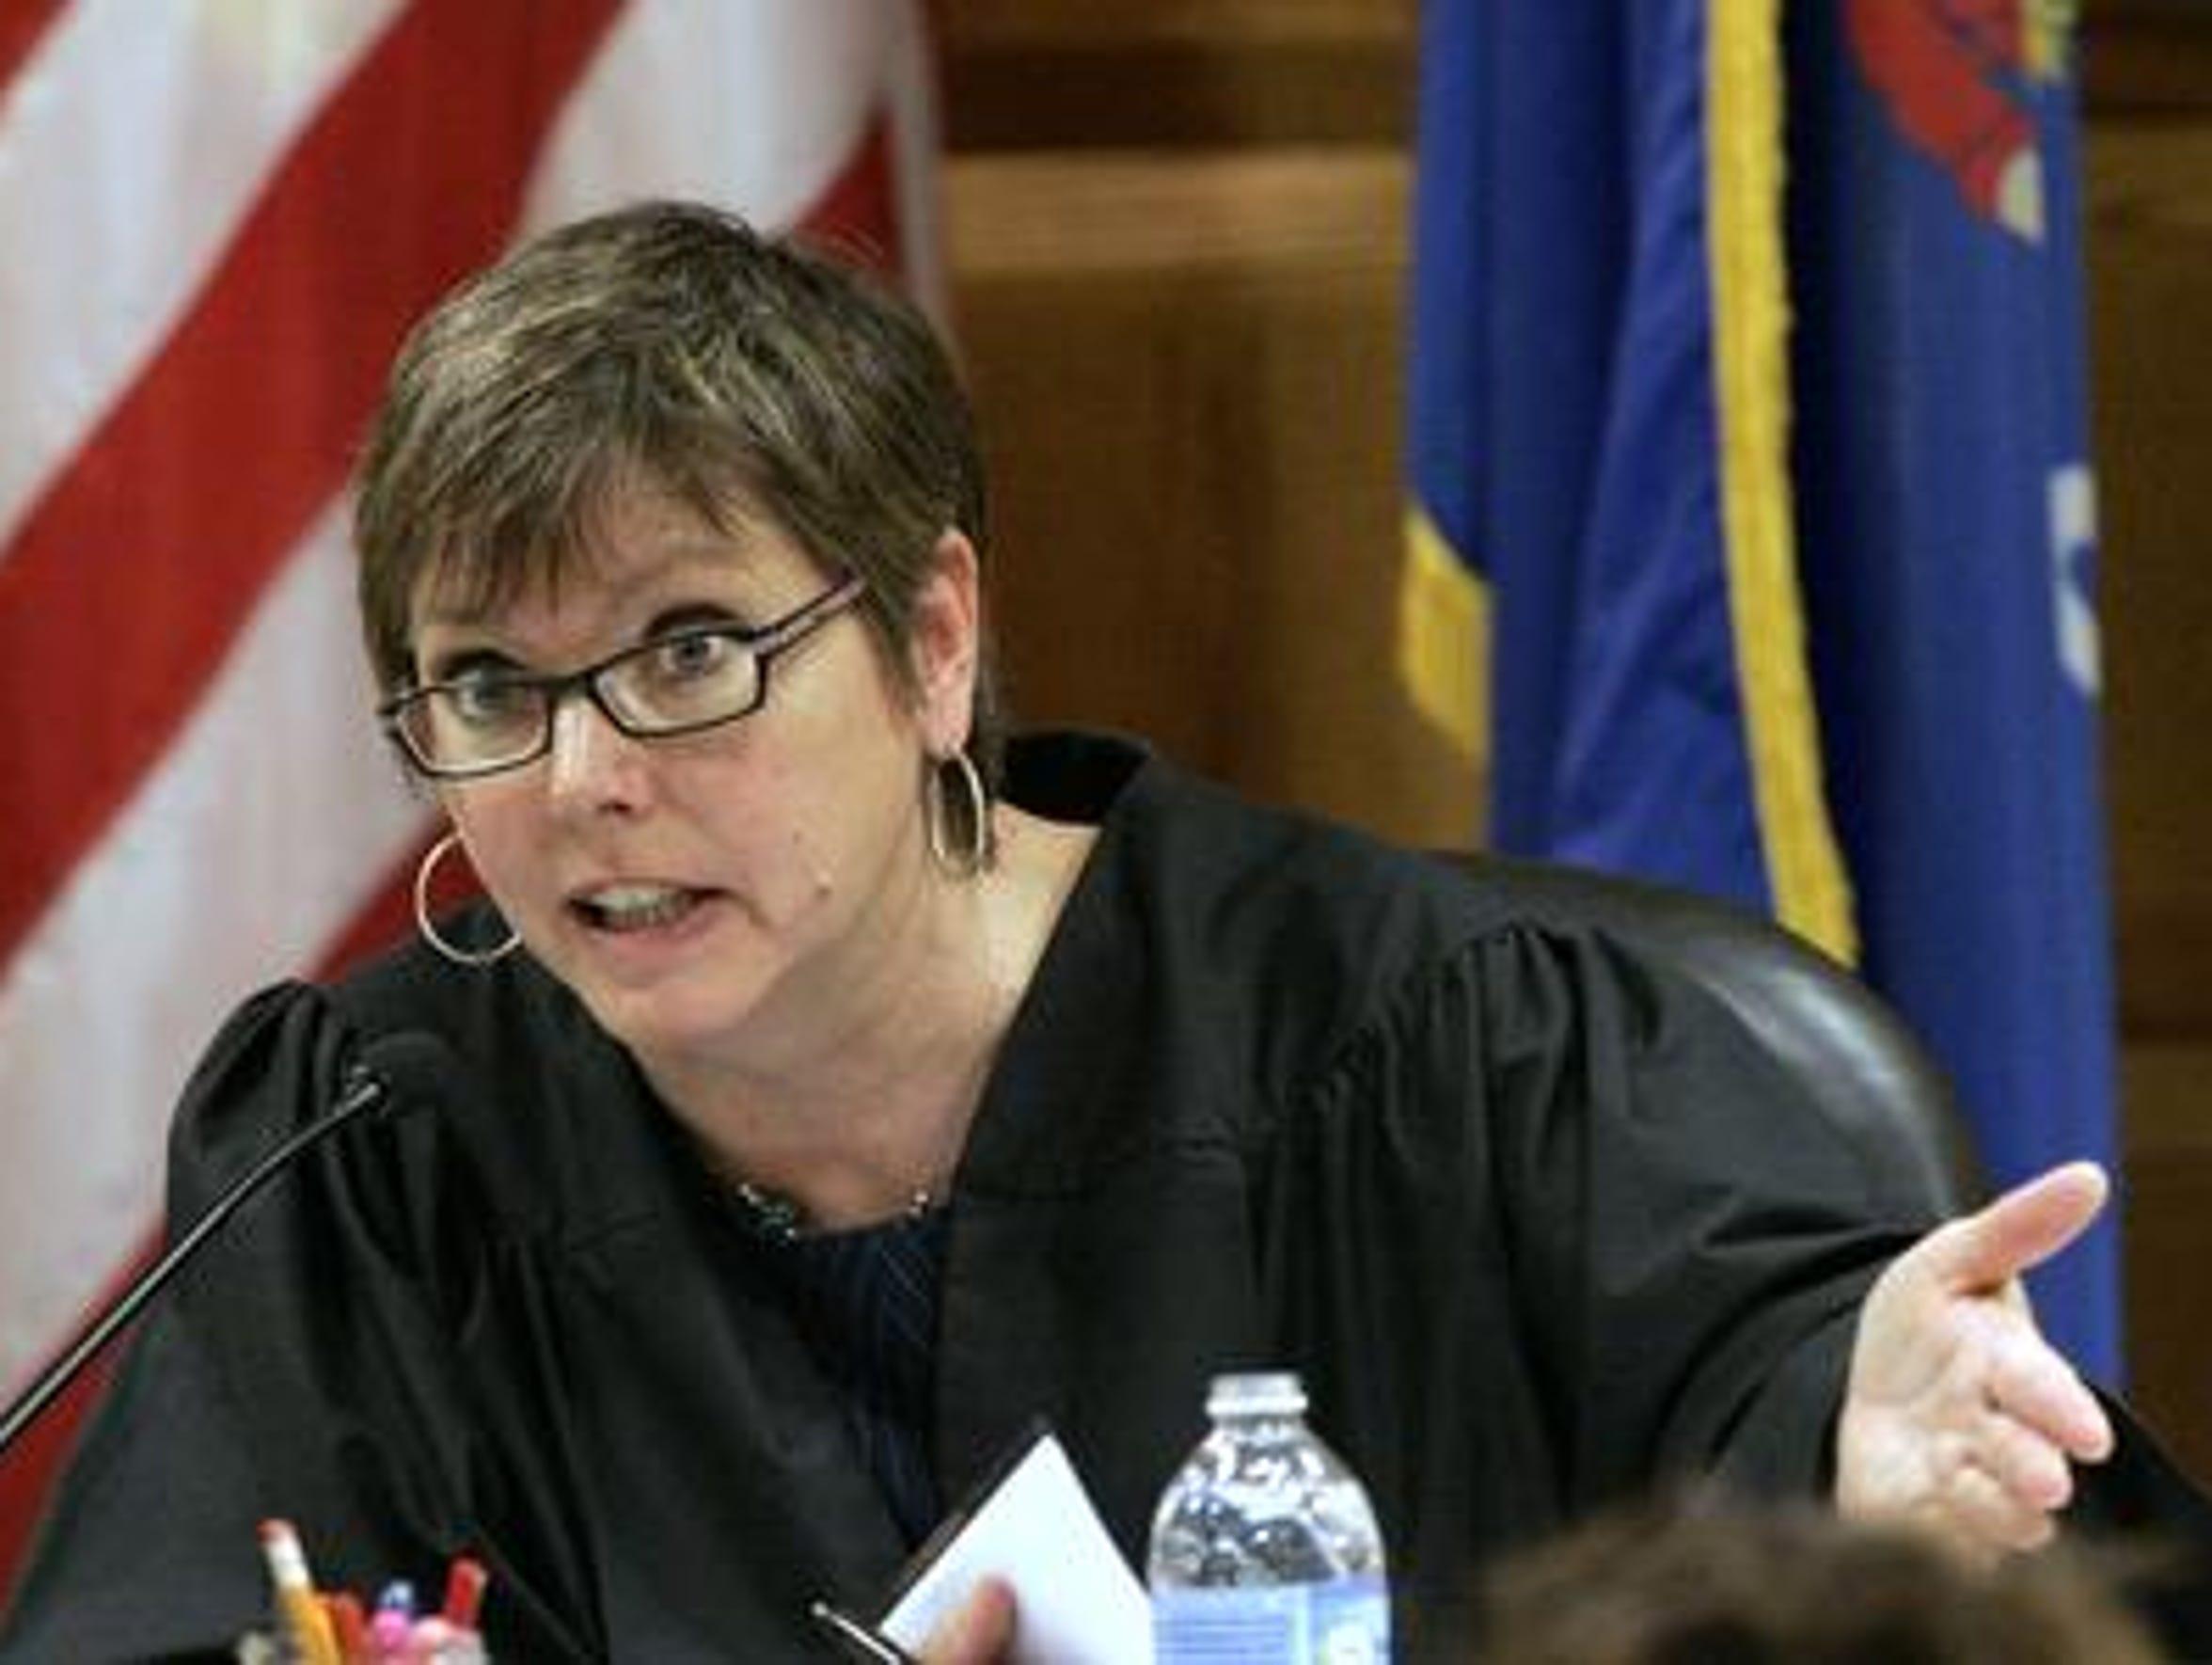 Outagamie County Judge Nancy Krueger sharply criticized